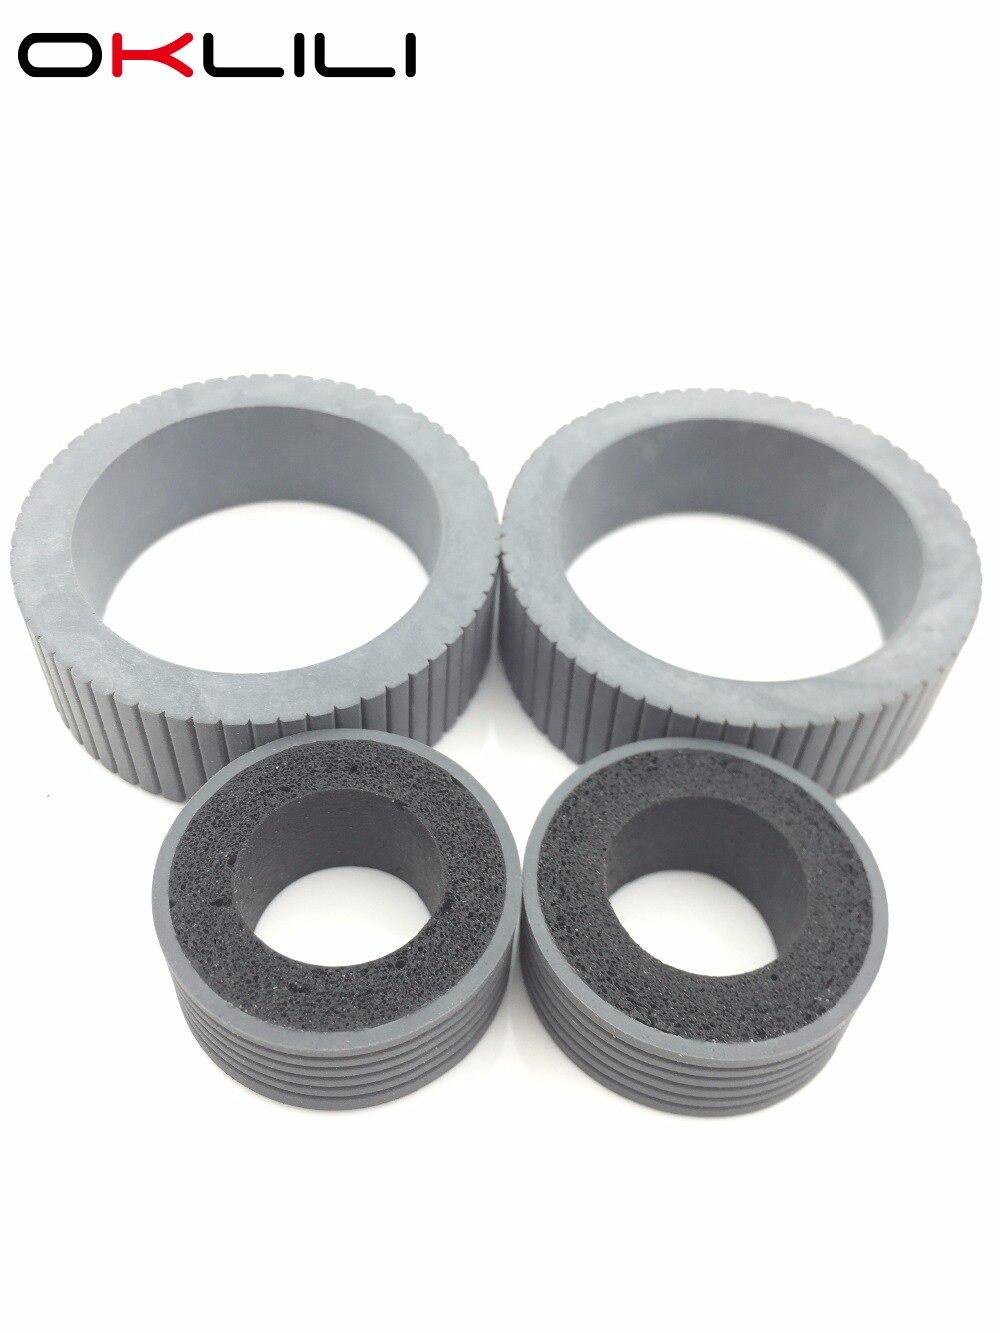 NEW PA03670-0001 PA03670-0002 Consumable Kit Pick Roller Brake Roller Pickup Roller for Fujitsu fi-7160 fi-7260 fi-7180 fi-7280